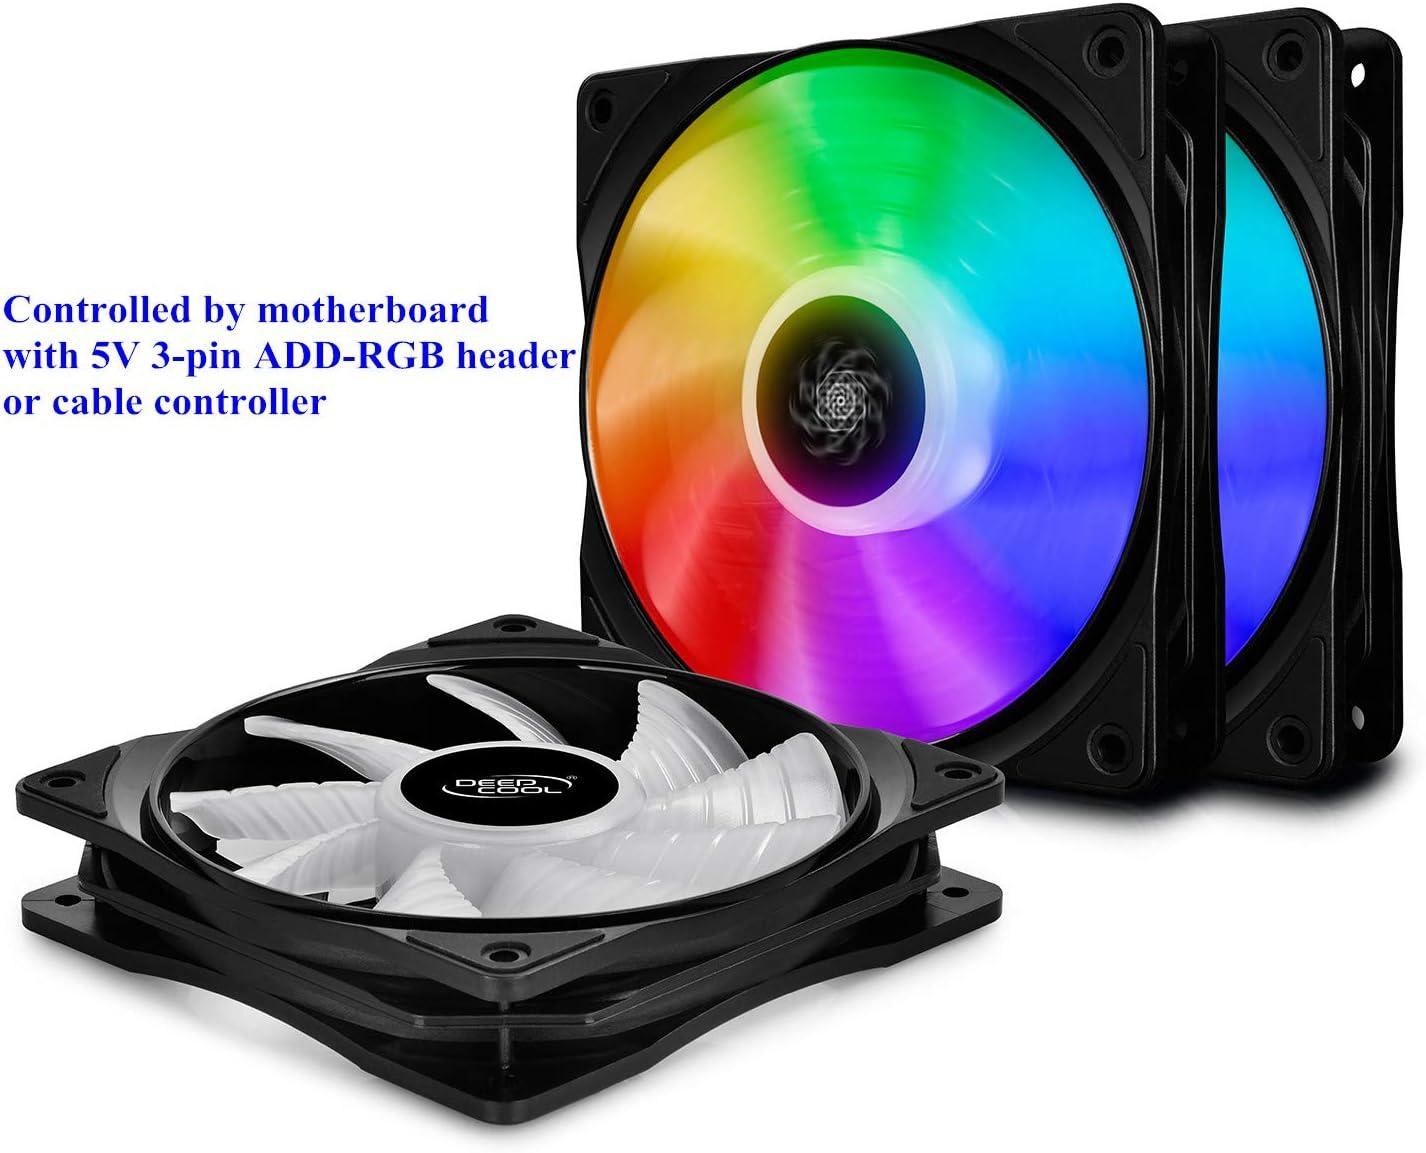 DEEP COOL CF120 PWM Ventilador RGB(120mm) Silencioso de Alto Rendimiento(3 en 1), Controlado por Controlador de Cable (Incluido) o de Placa Madre con Cabezal de 5v 3-Pin